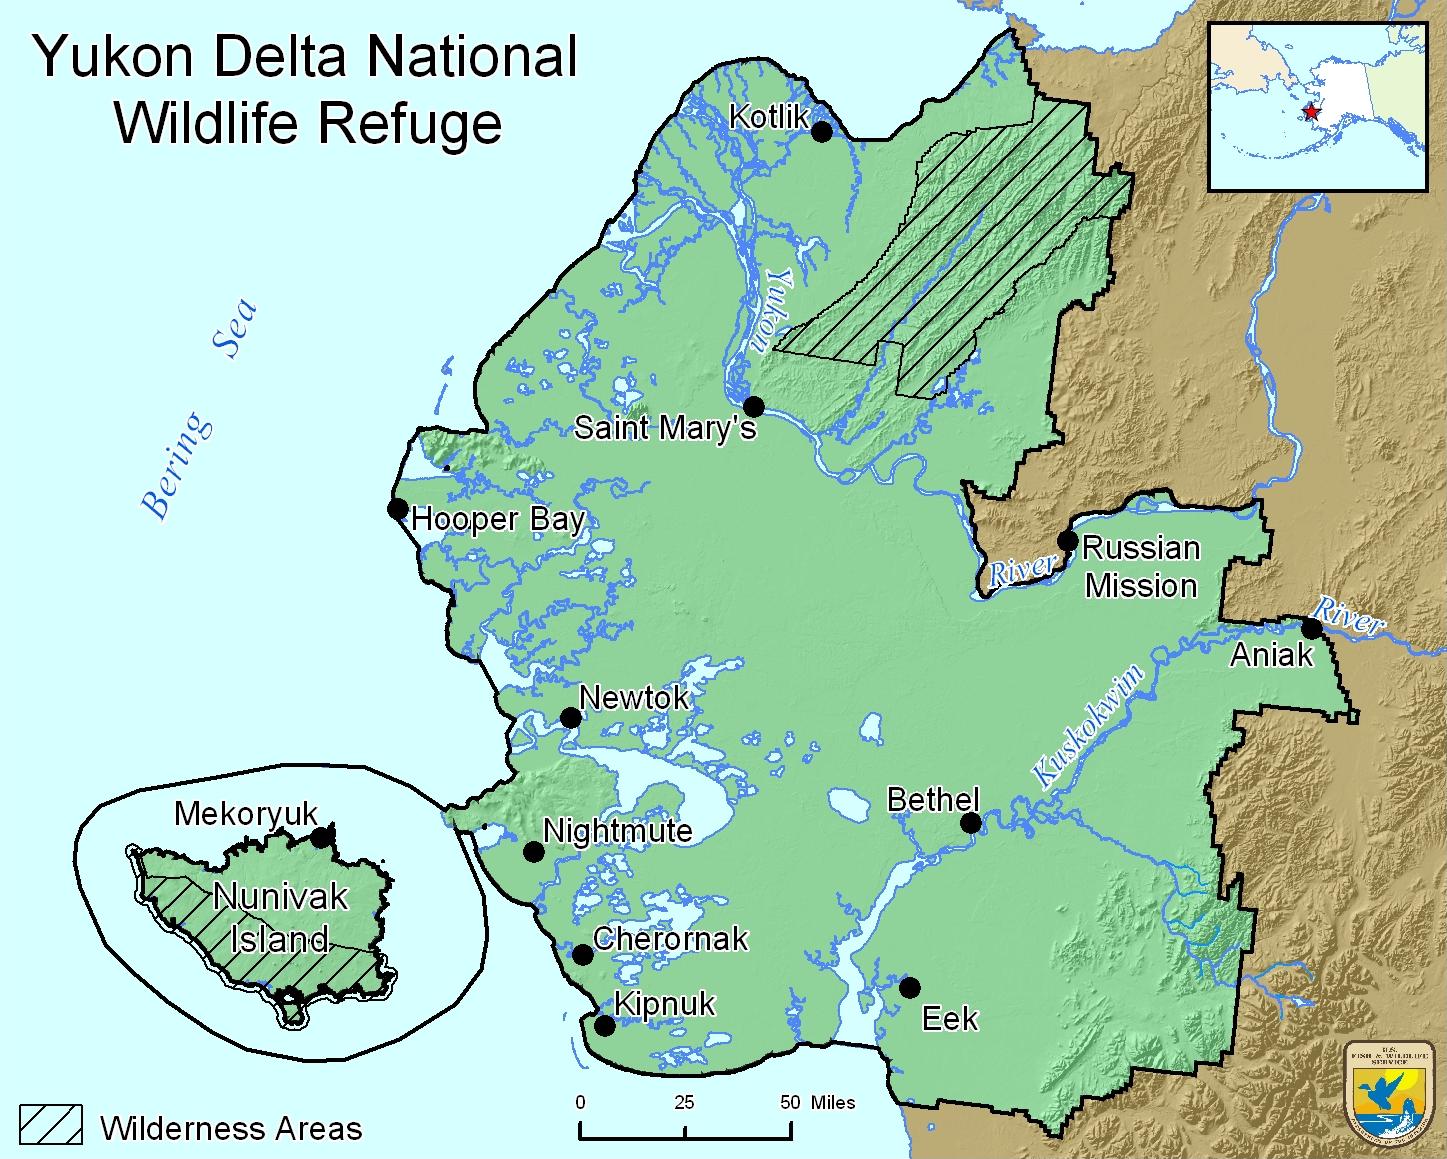 FileMap of the Yukon Delta National Wildlife Refugepng